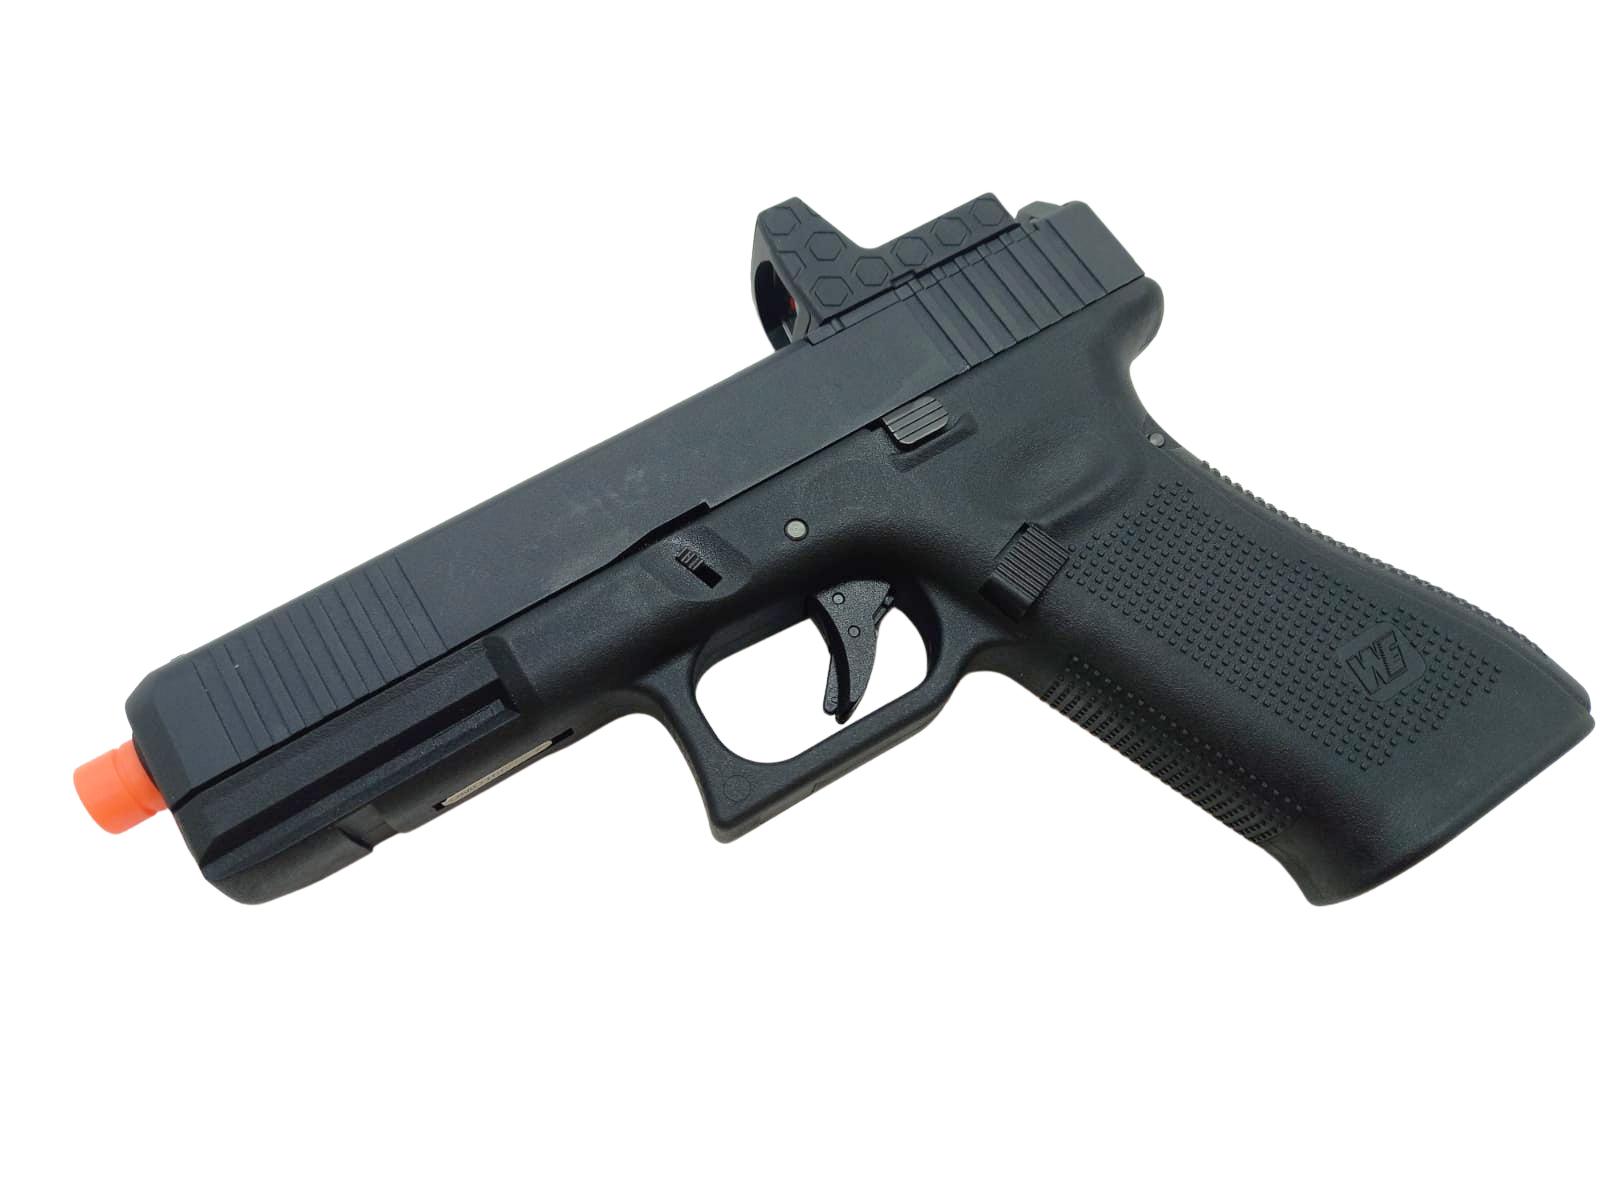 Pistola Airsoft WE Glock G17 Gen 5 MOS GBB Metal e Polímero Black - Calibre 6 mm  - MAB AIRSOFT